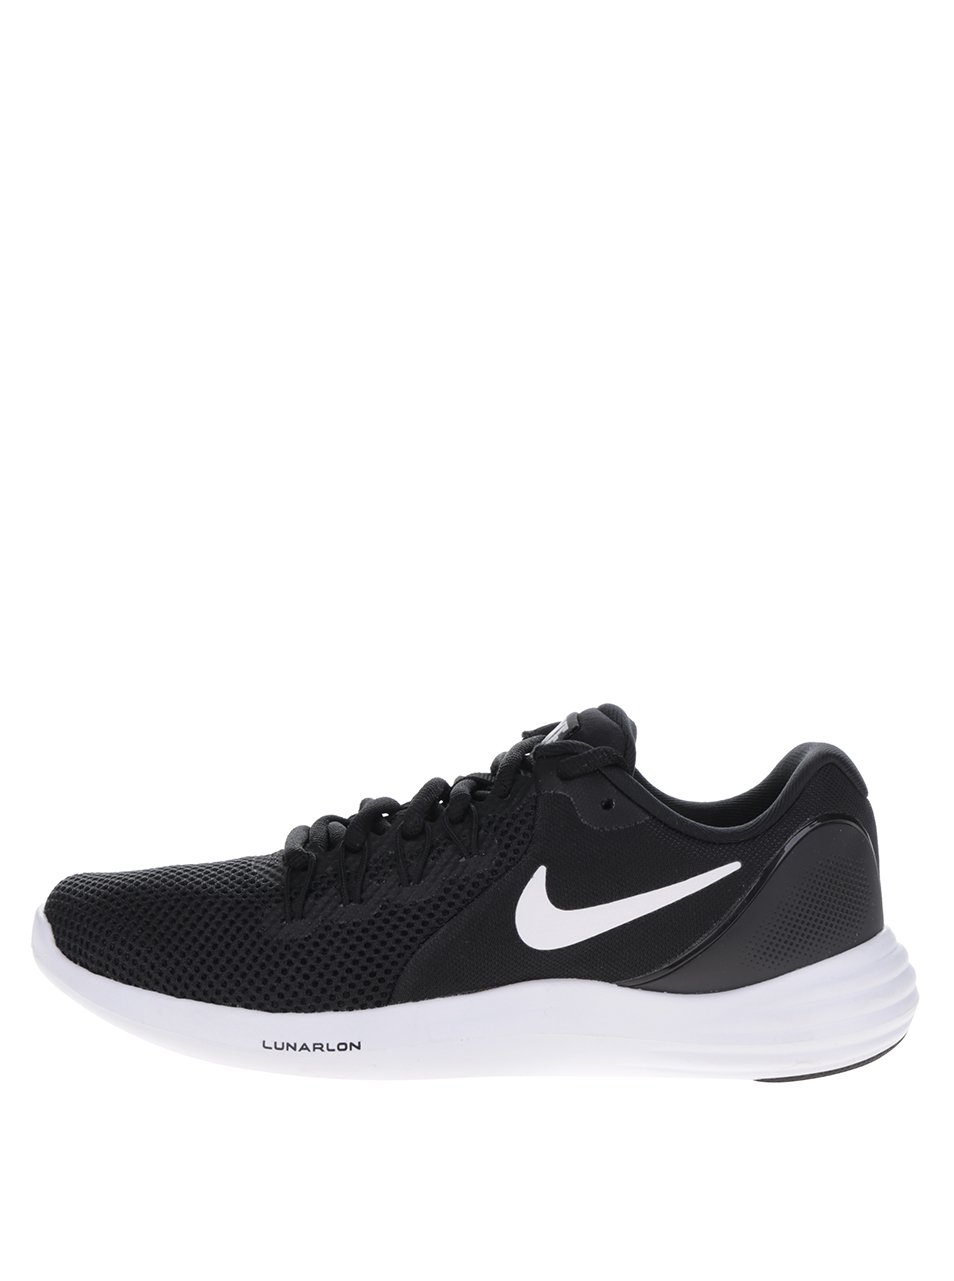 Černé dámské perforované tenisky Nike Lunar Apparent